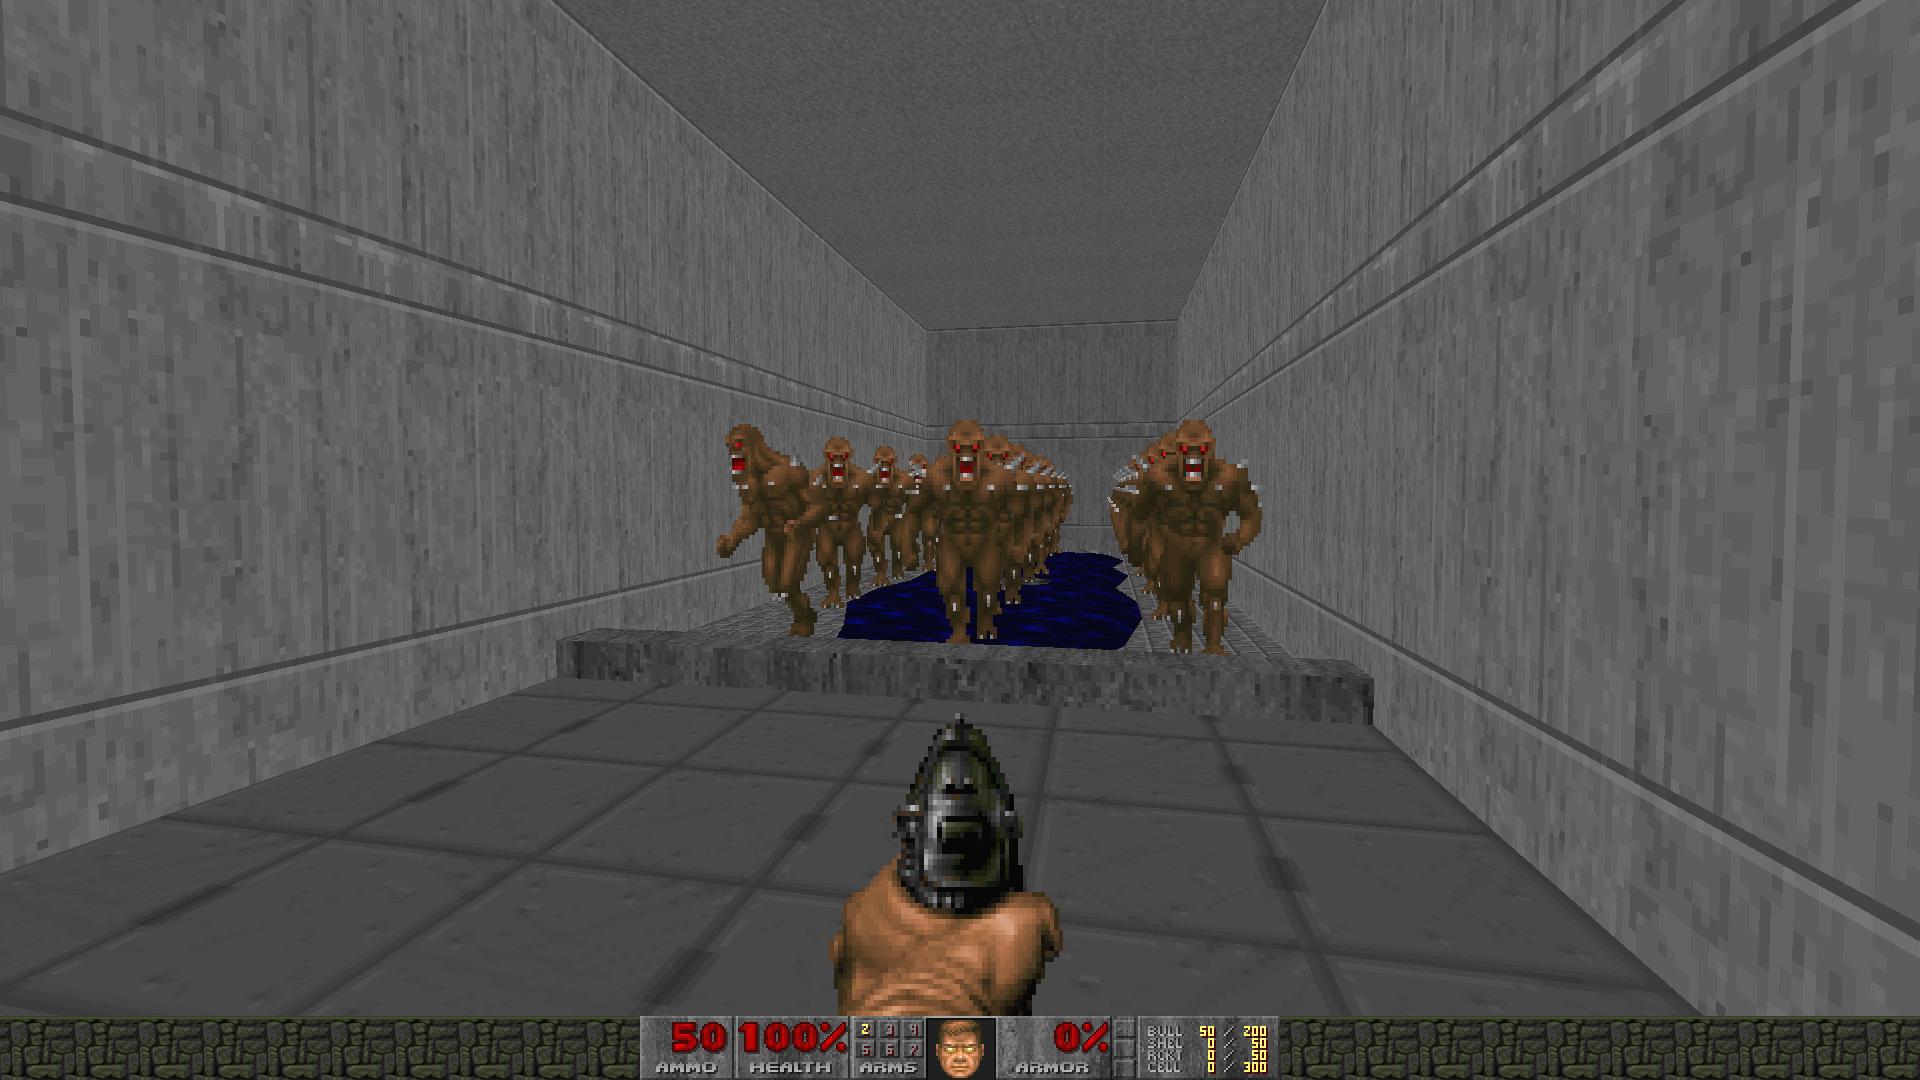 Screenshot_Doom_20200102_144839.png.ee549d3c06f91a7dfa4a2a4a49734e93.png